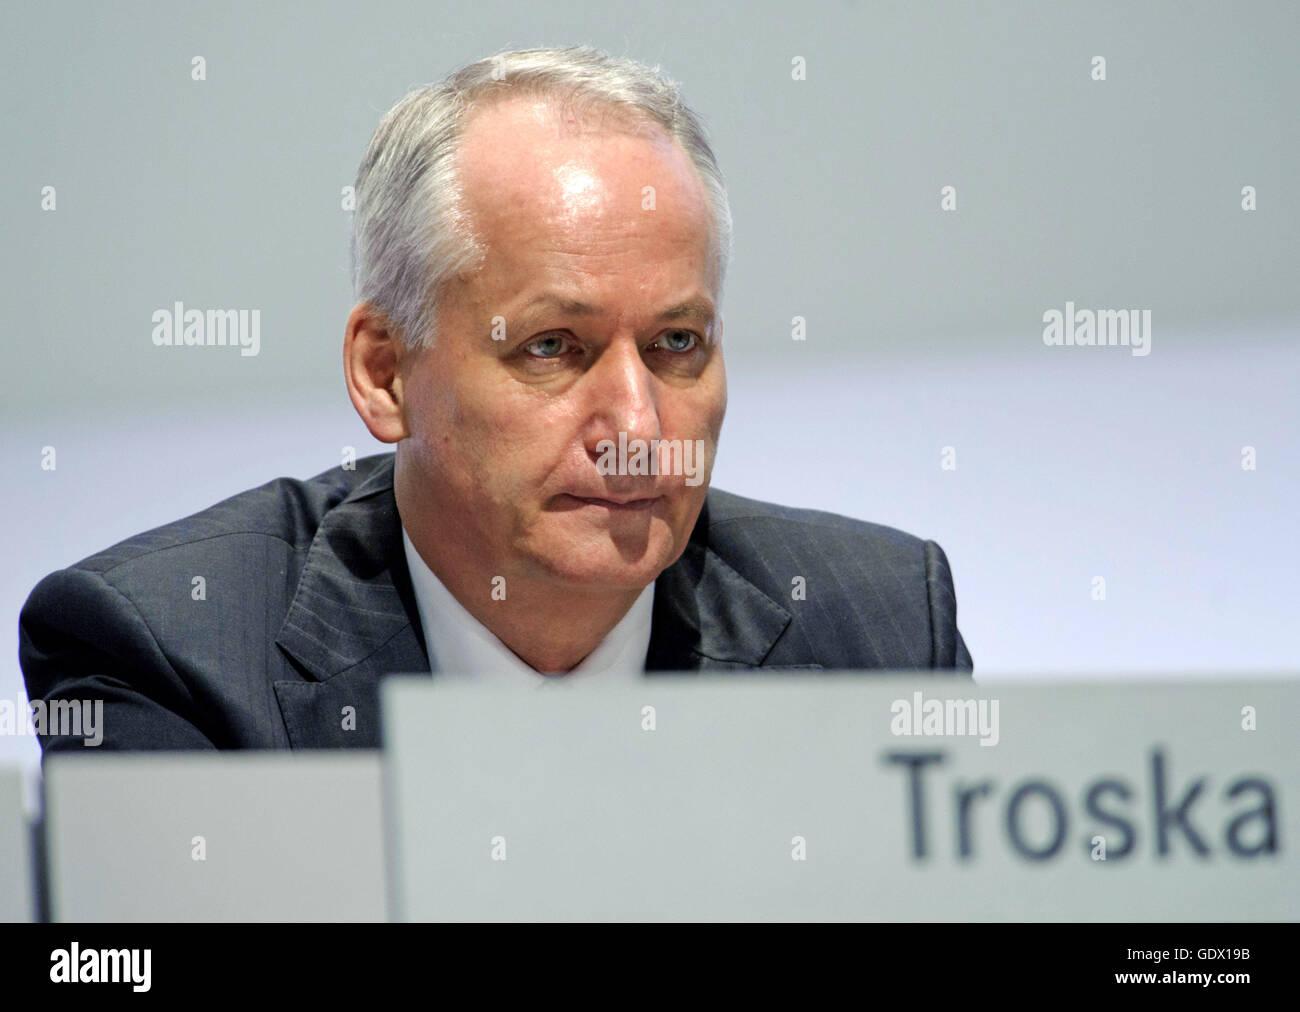 Hubertus Troska Photo Stock